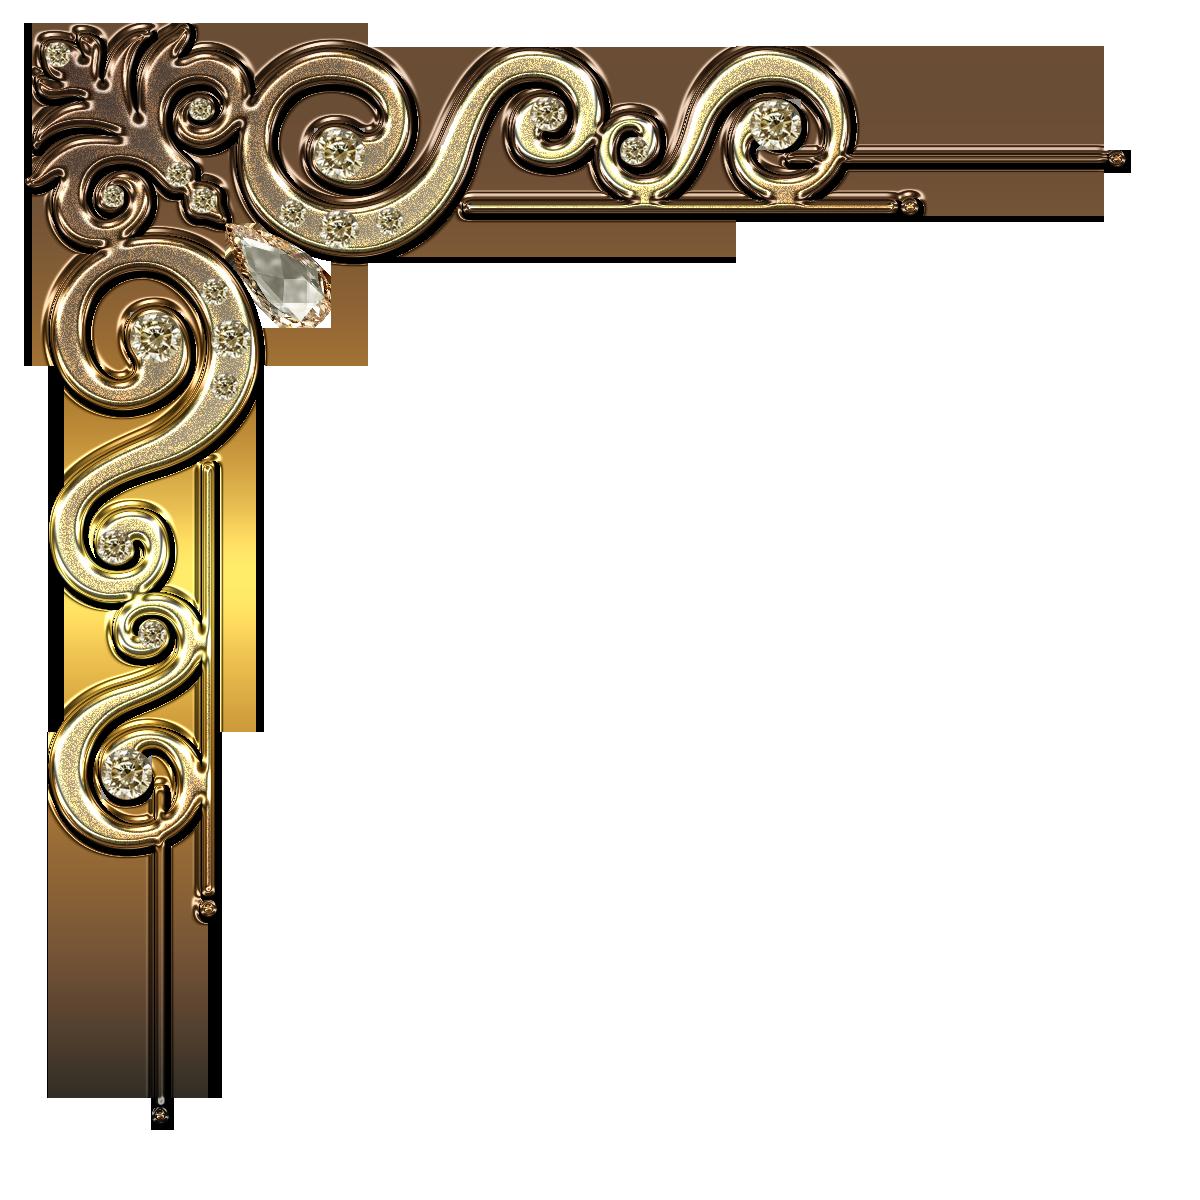 PNG Corner Designs - 137673